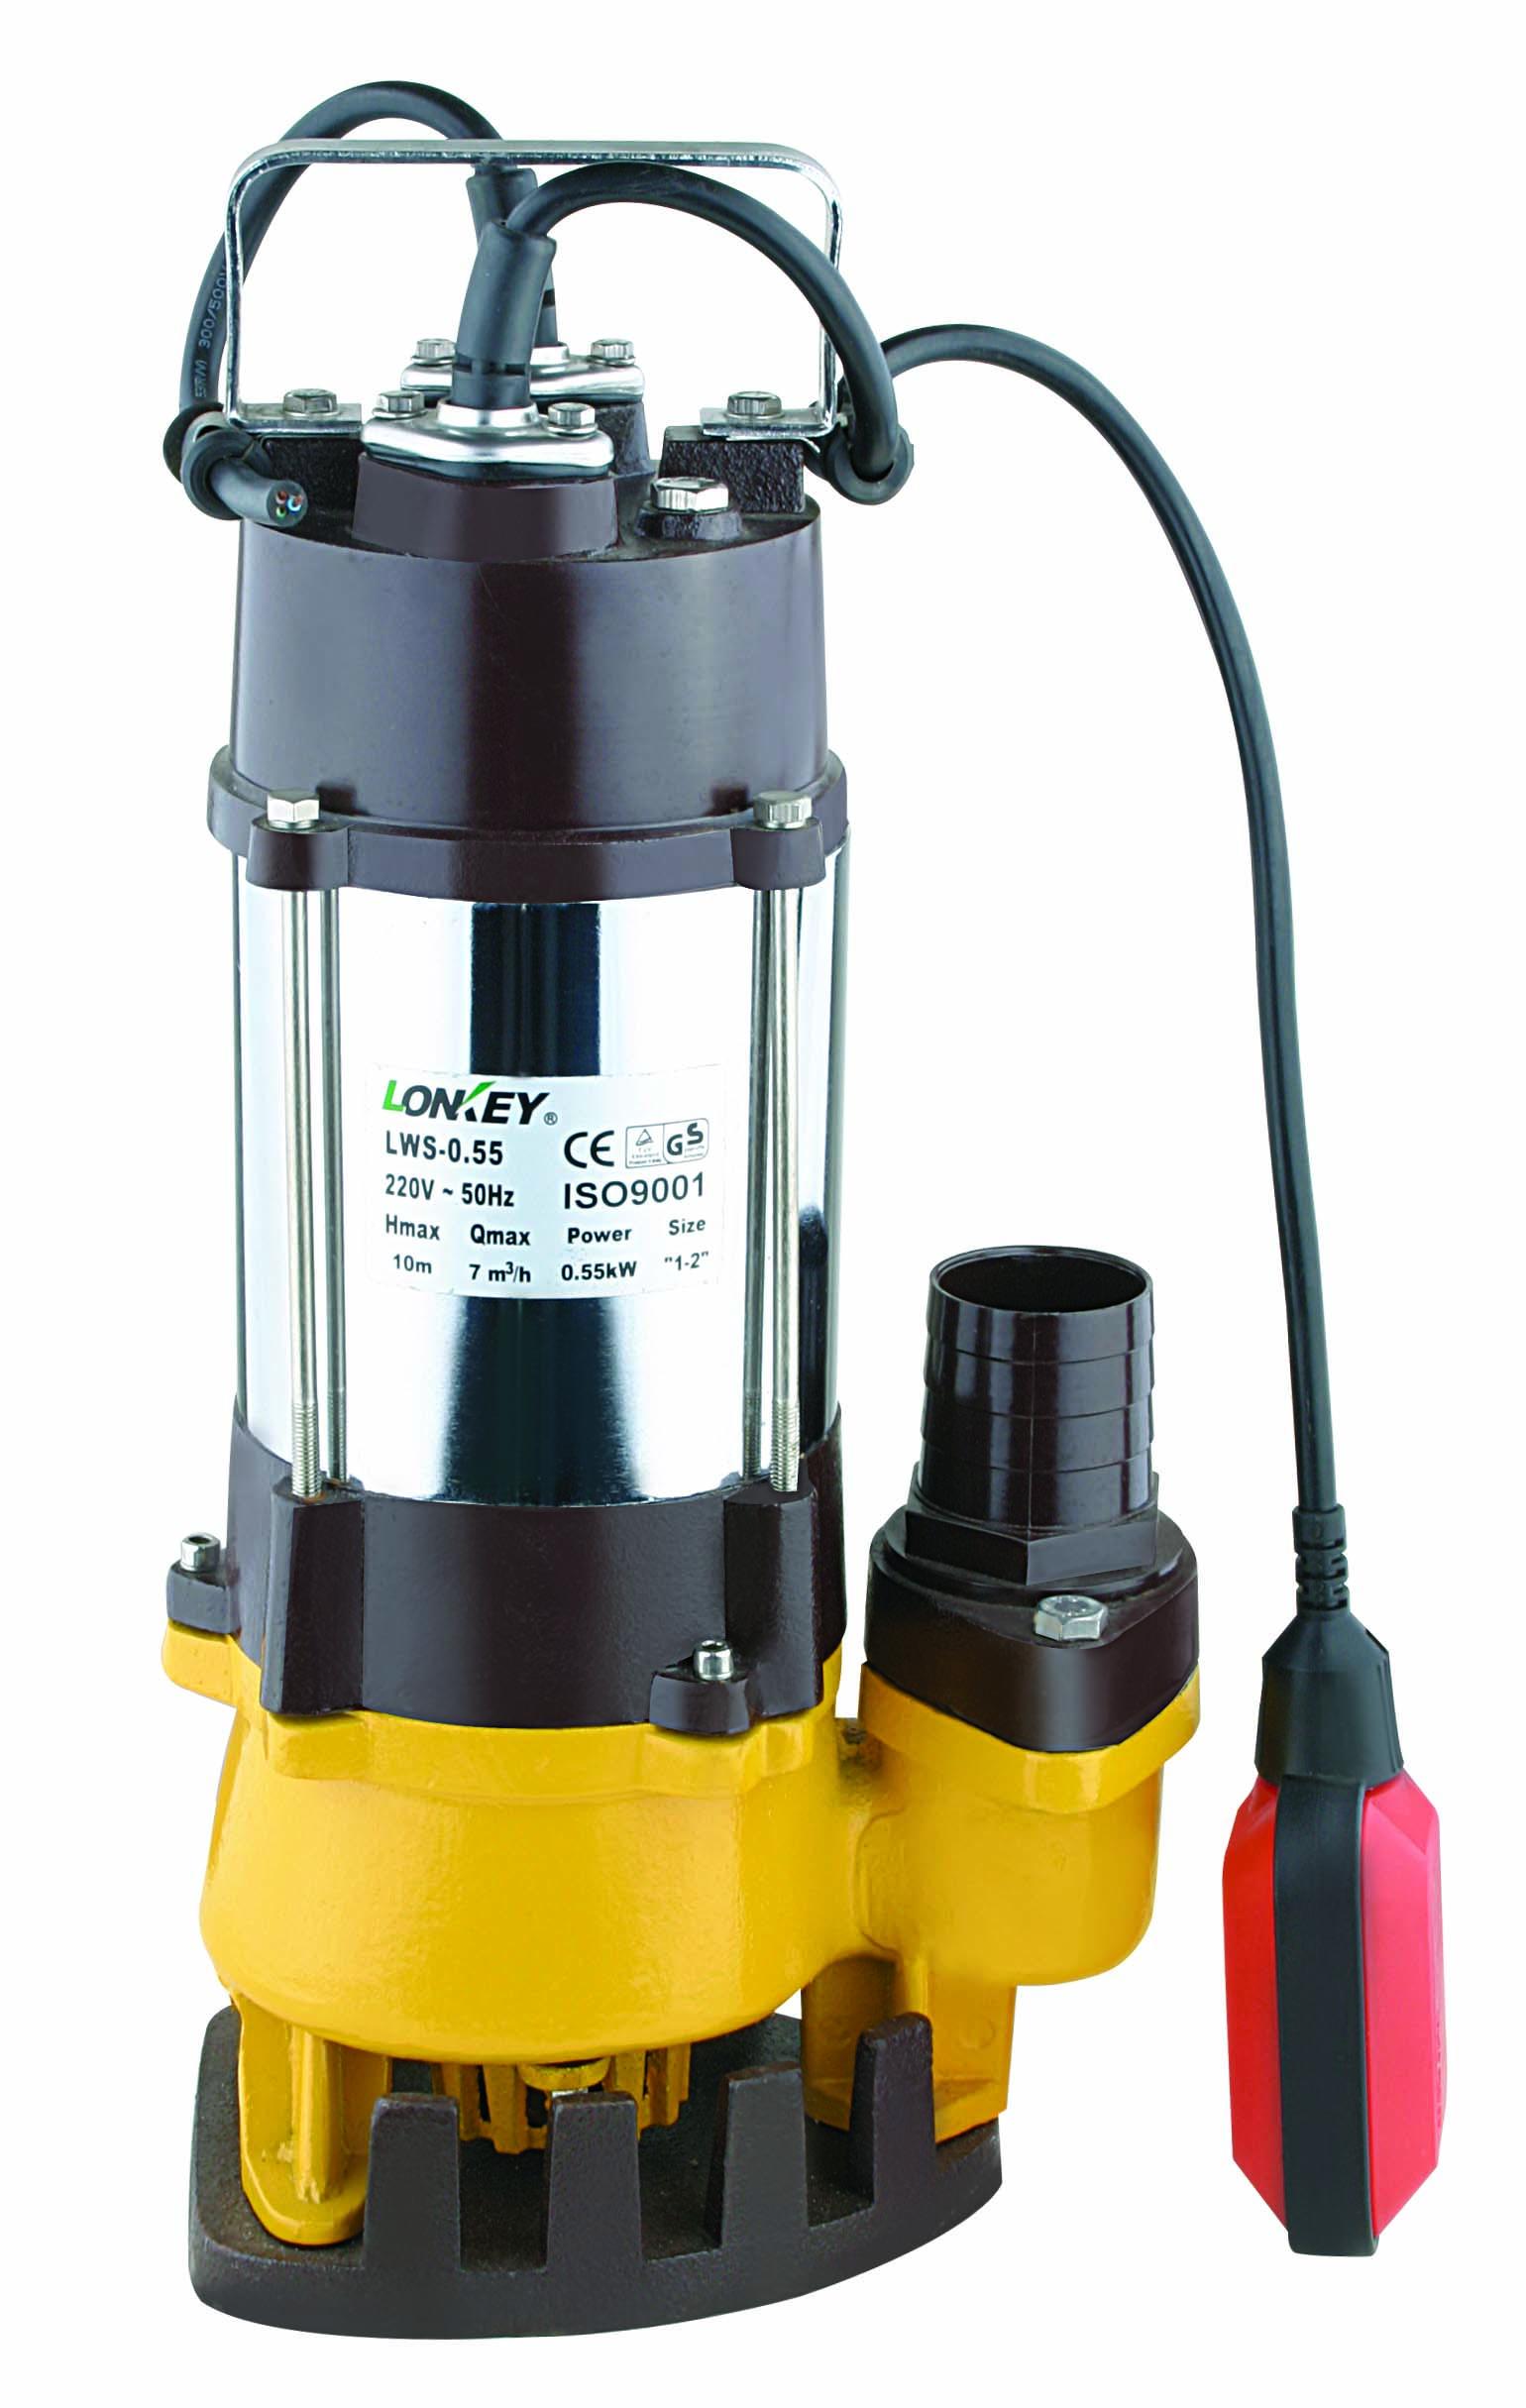 Submersible Water Pump, Sewage Submersible Pump LWS-0.75F